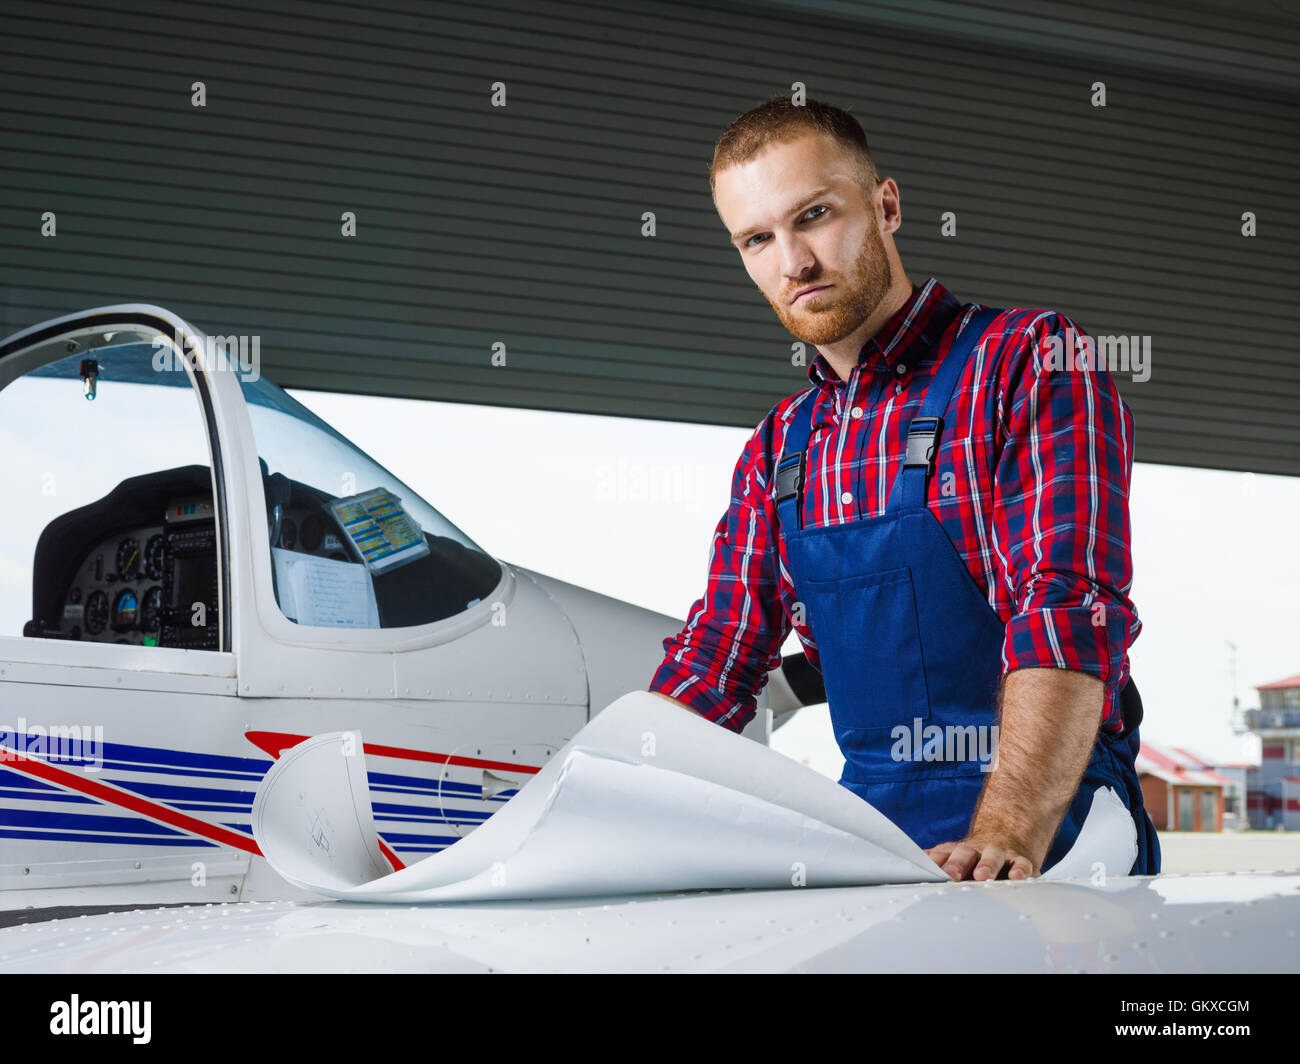 Serious aircraft mechanic looking at camera - Stock Image